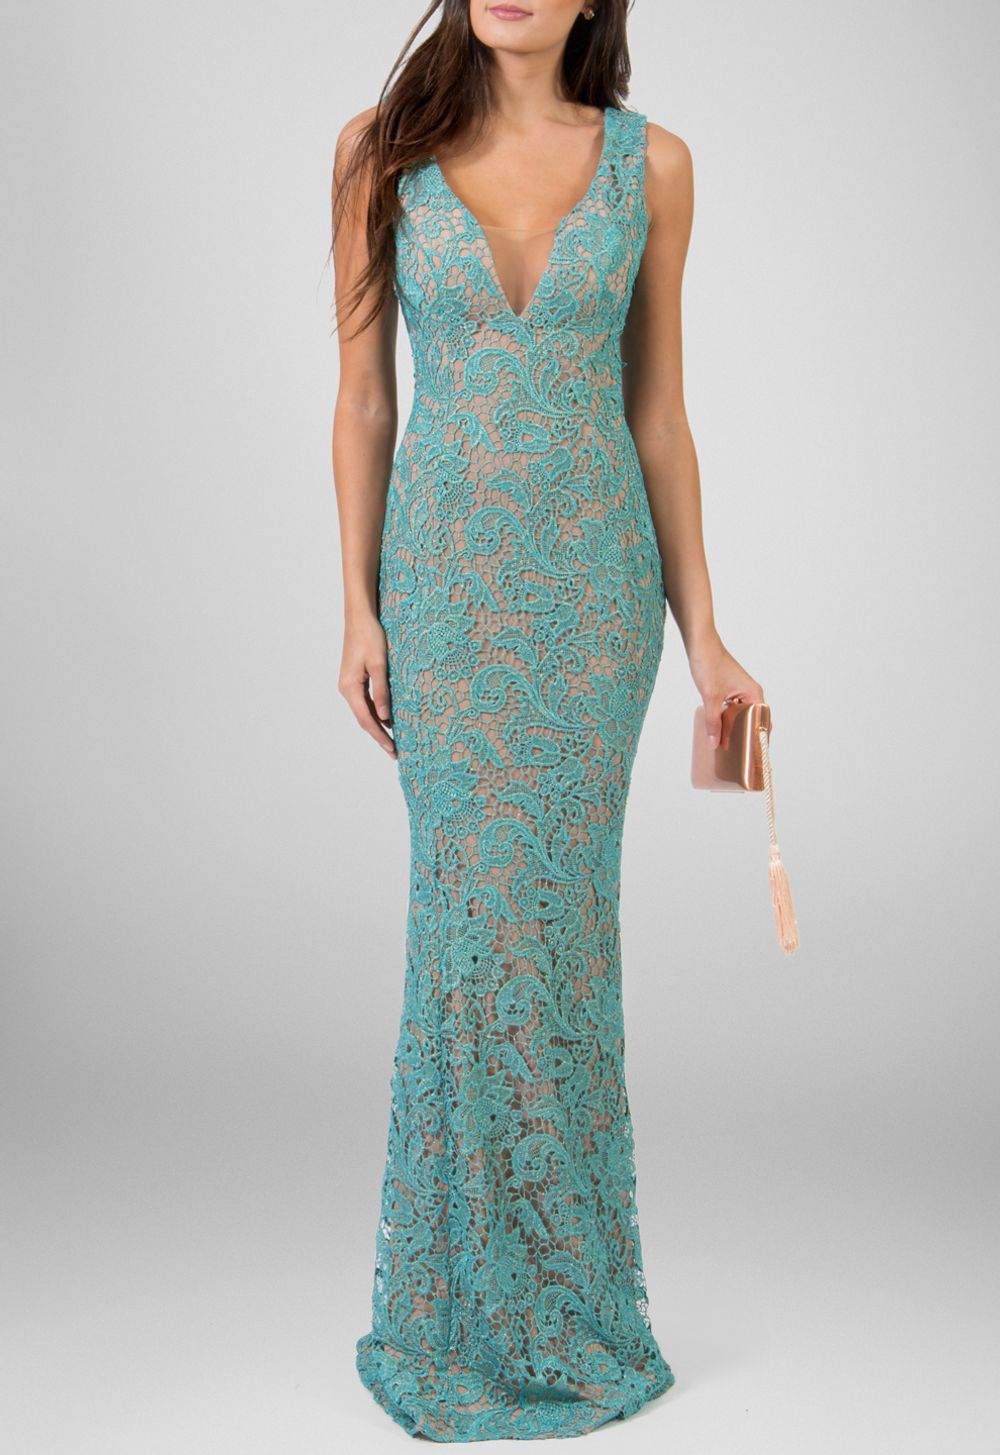 c398e759d Vestido longo de renda guipir azul com dourado Powerlook - powerlook